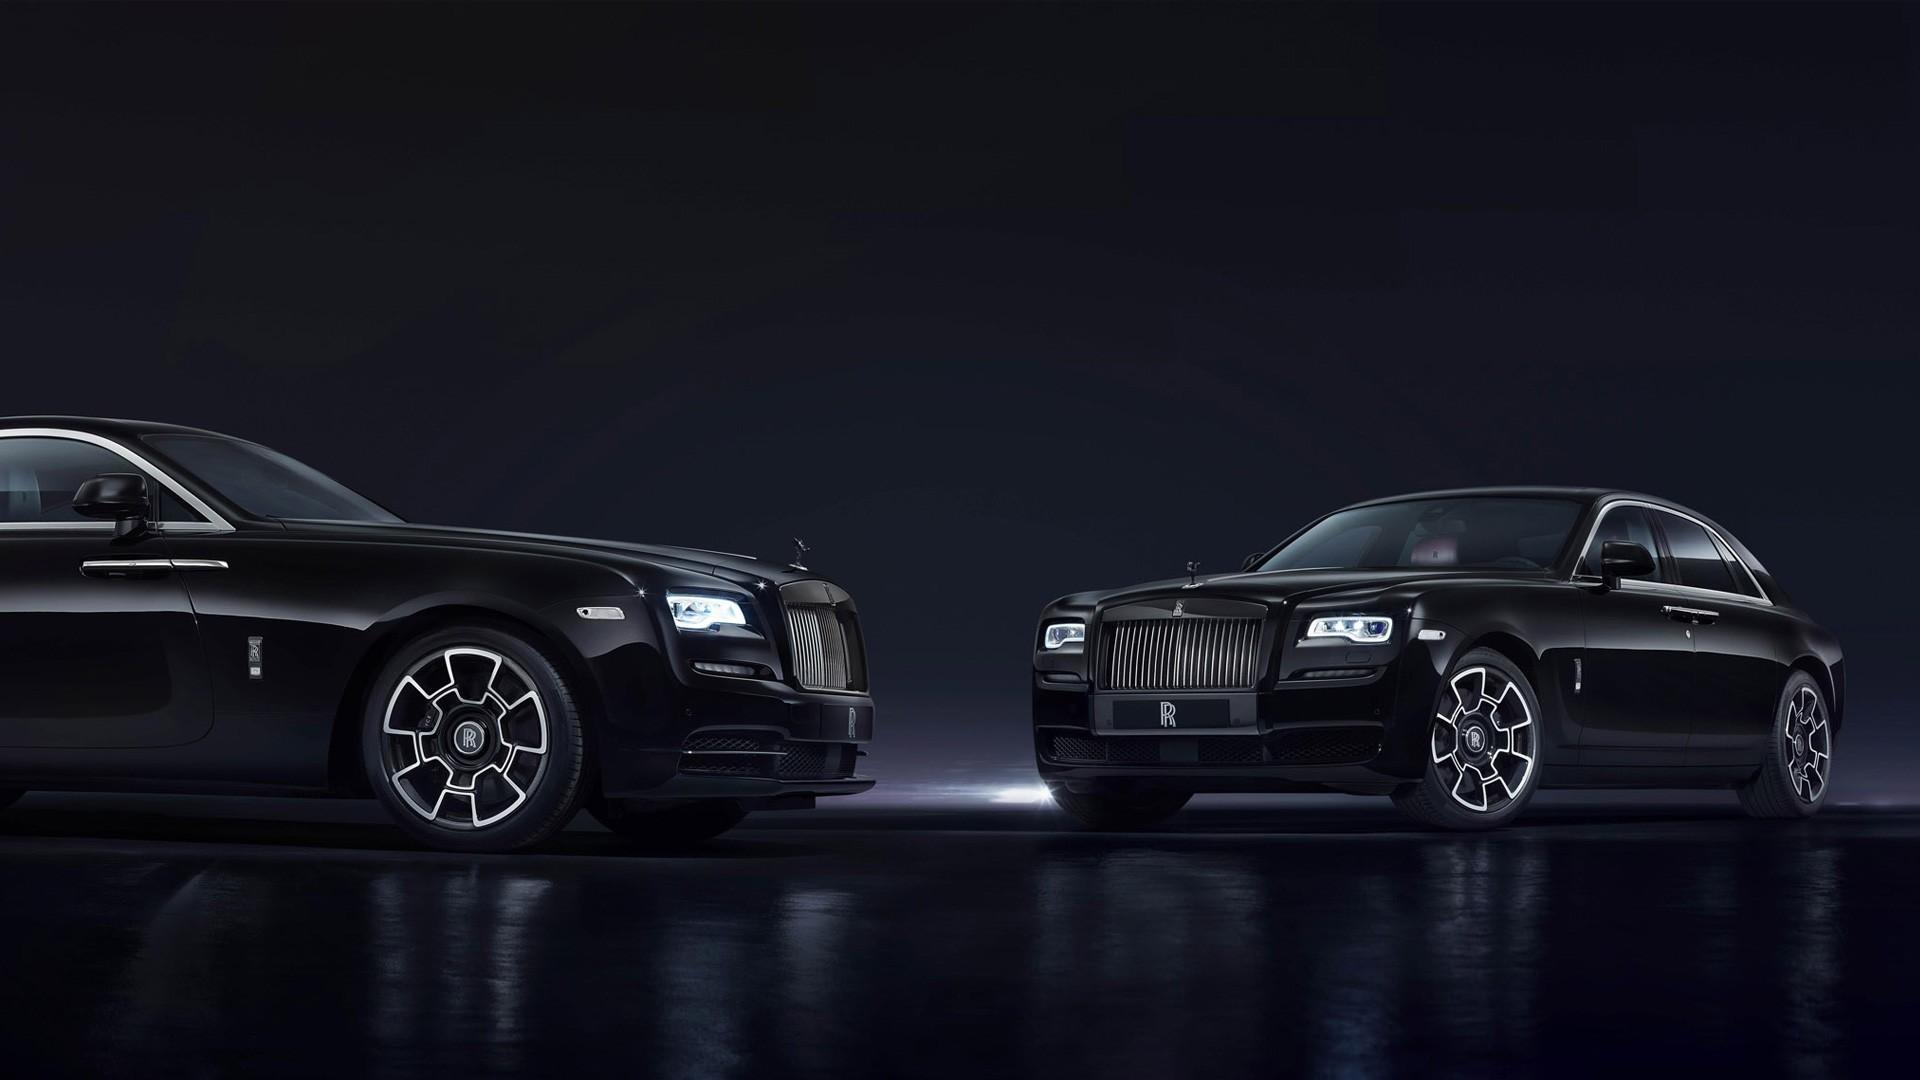 Rolls Royce Ghost Wraith Black Badge 2016 Wallpaper